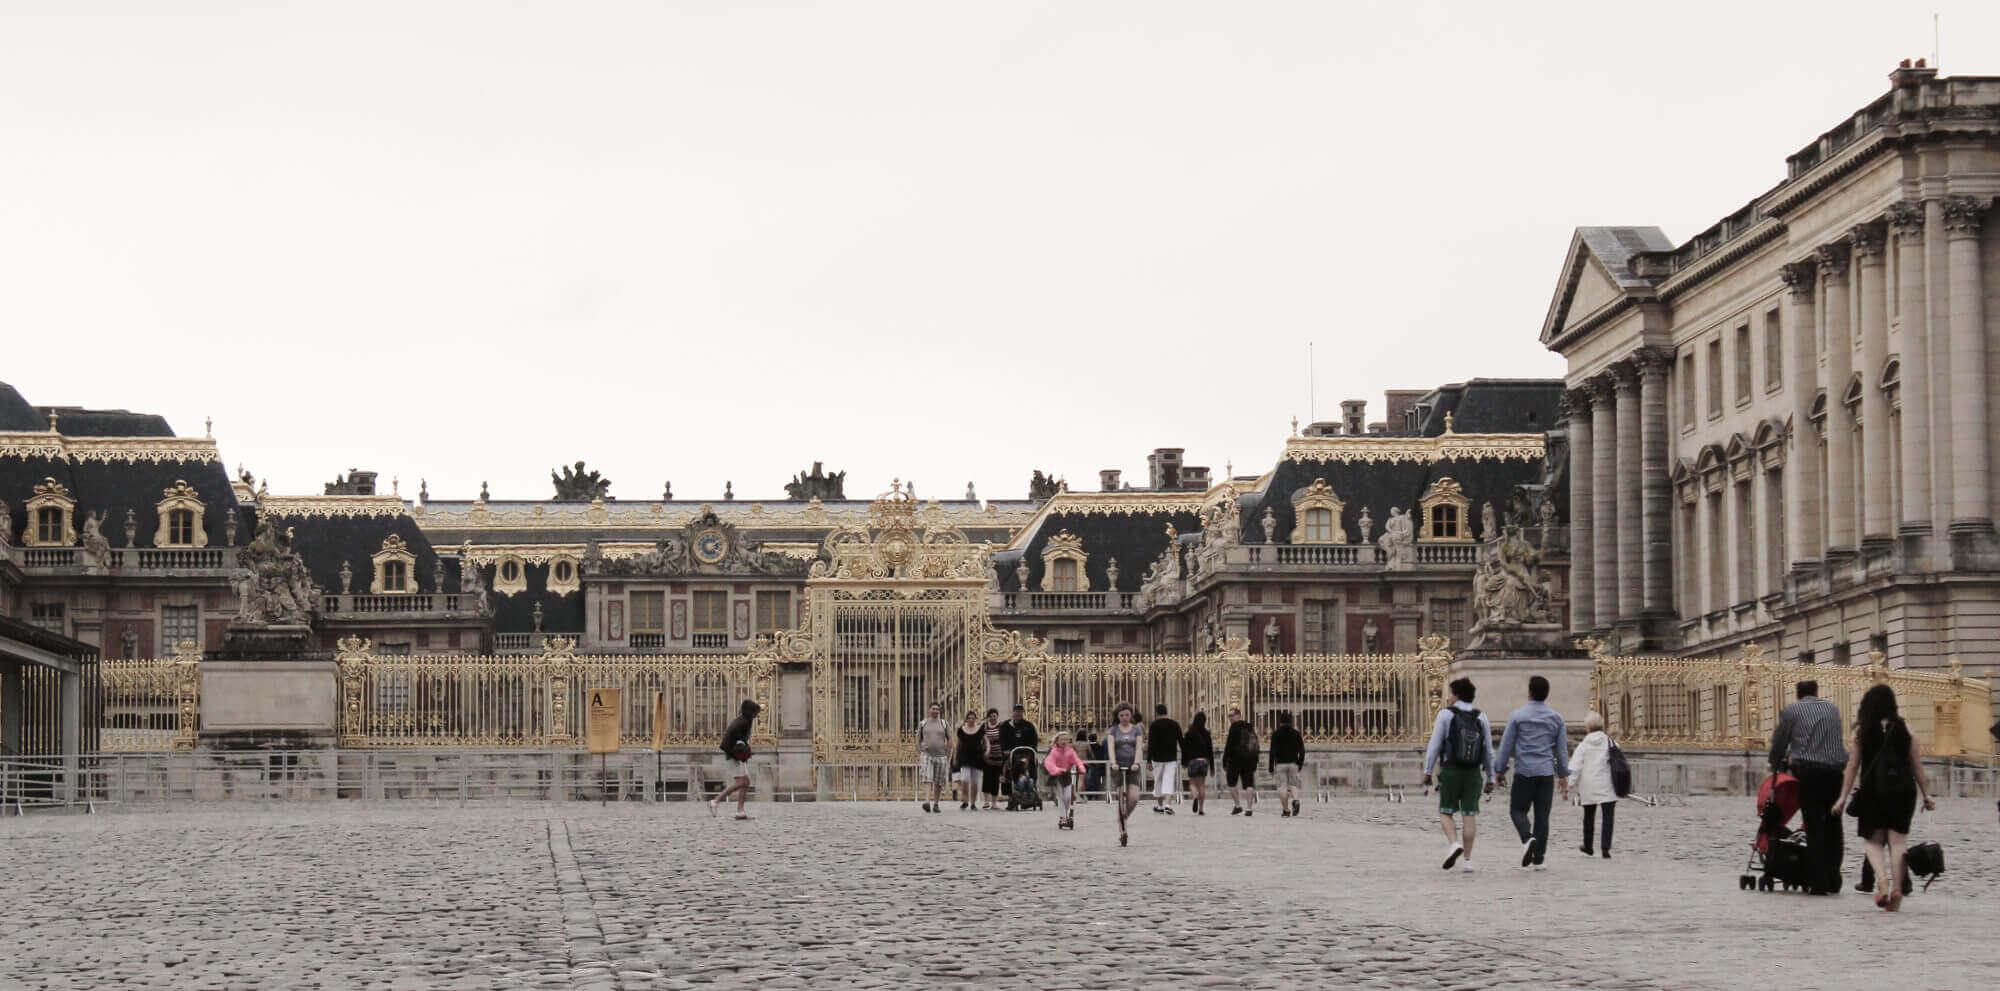 Blick auf Eingang des Palastes in Versailles